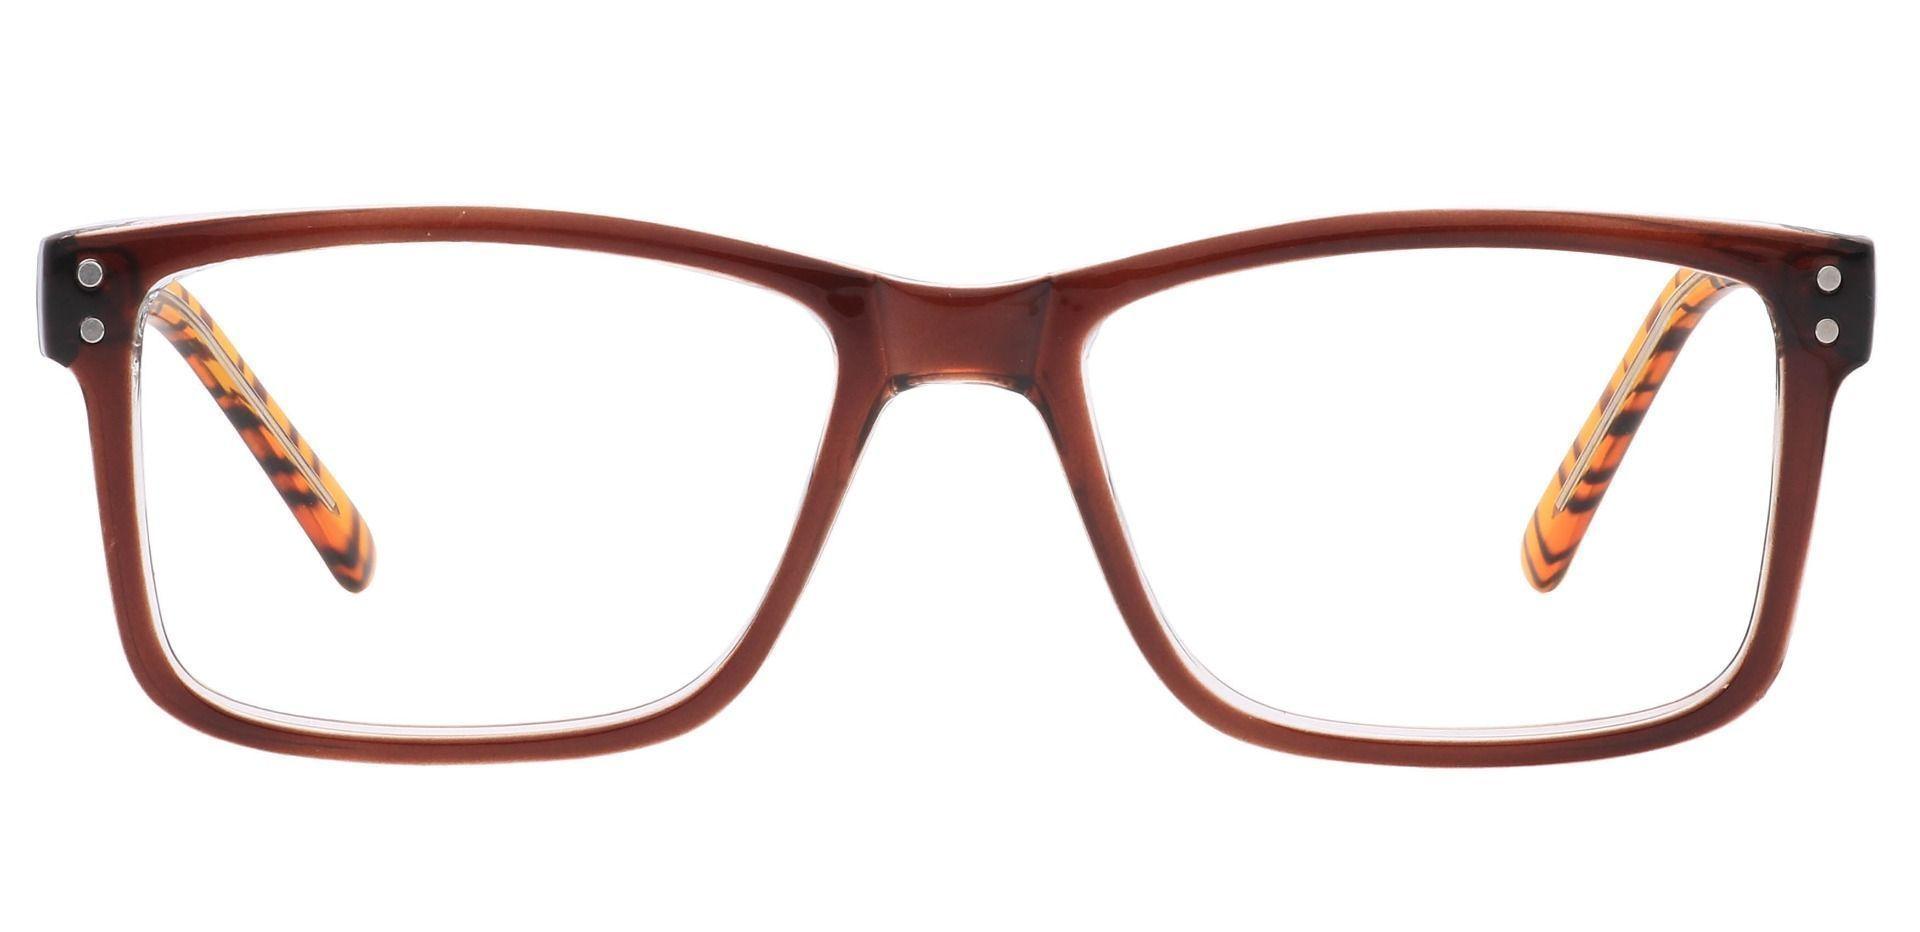 Bedford Rectangle Prescription Glasses - Brown